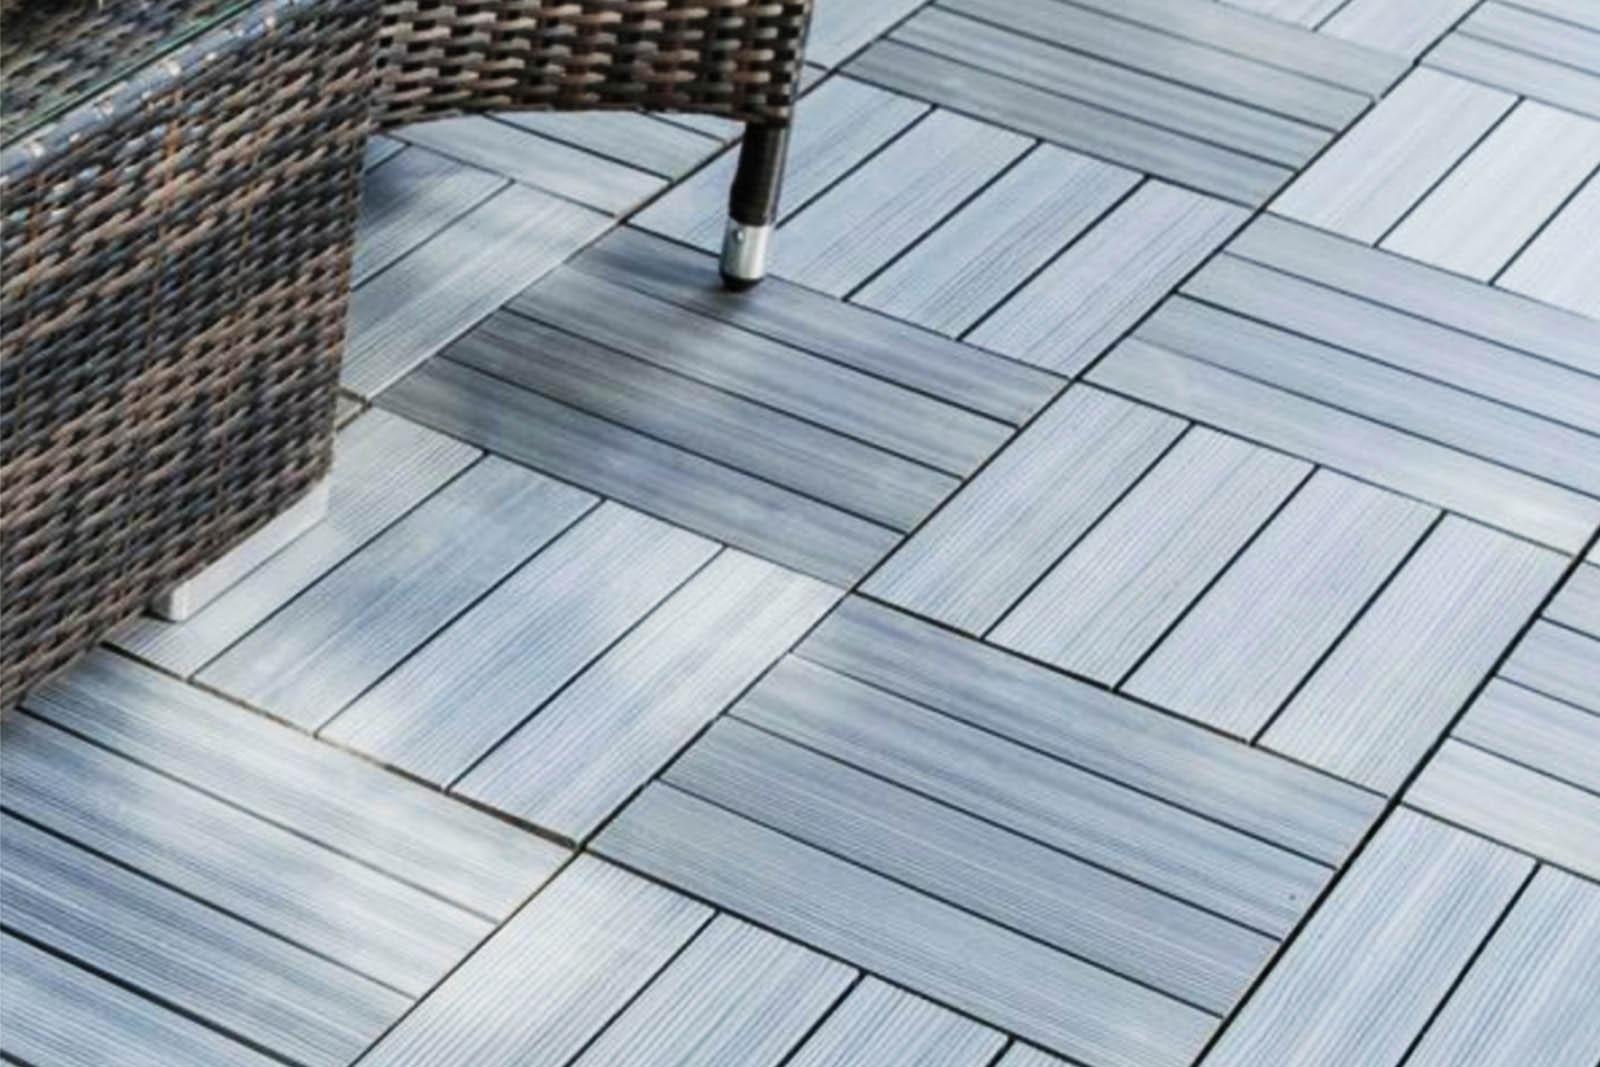 ... aspects of outdoor flooring ... MWQVVUR